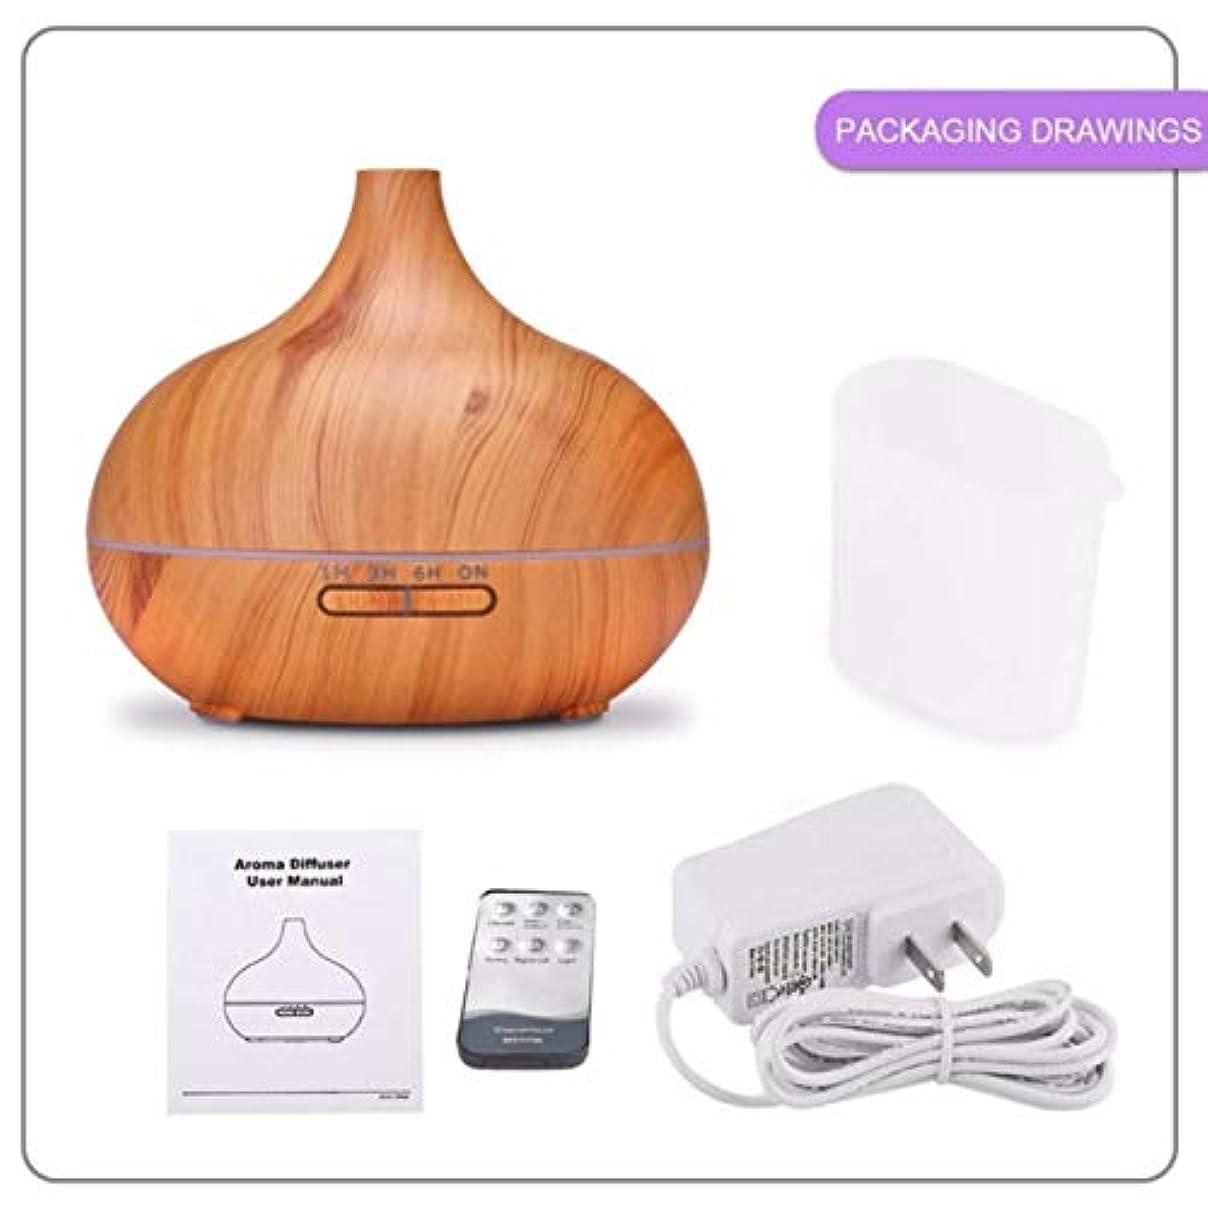 Saikogoods ホームオフィス用400ML超静音リモートコントロール超音波オイルディフューザー加湿器アロマアロマミストメーカー ライトウッド